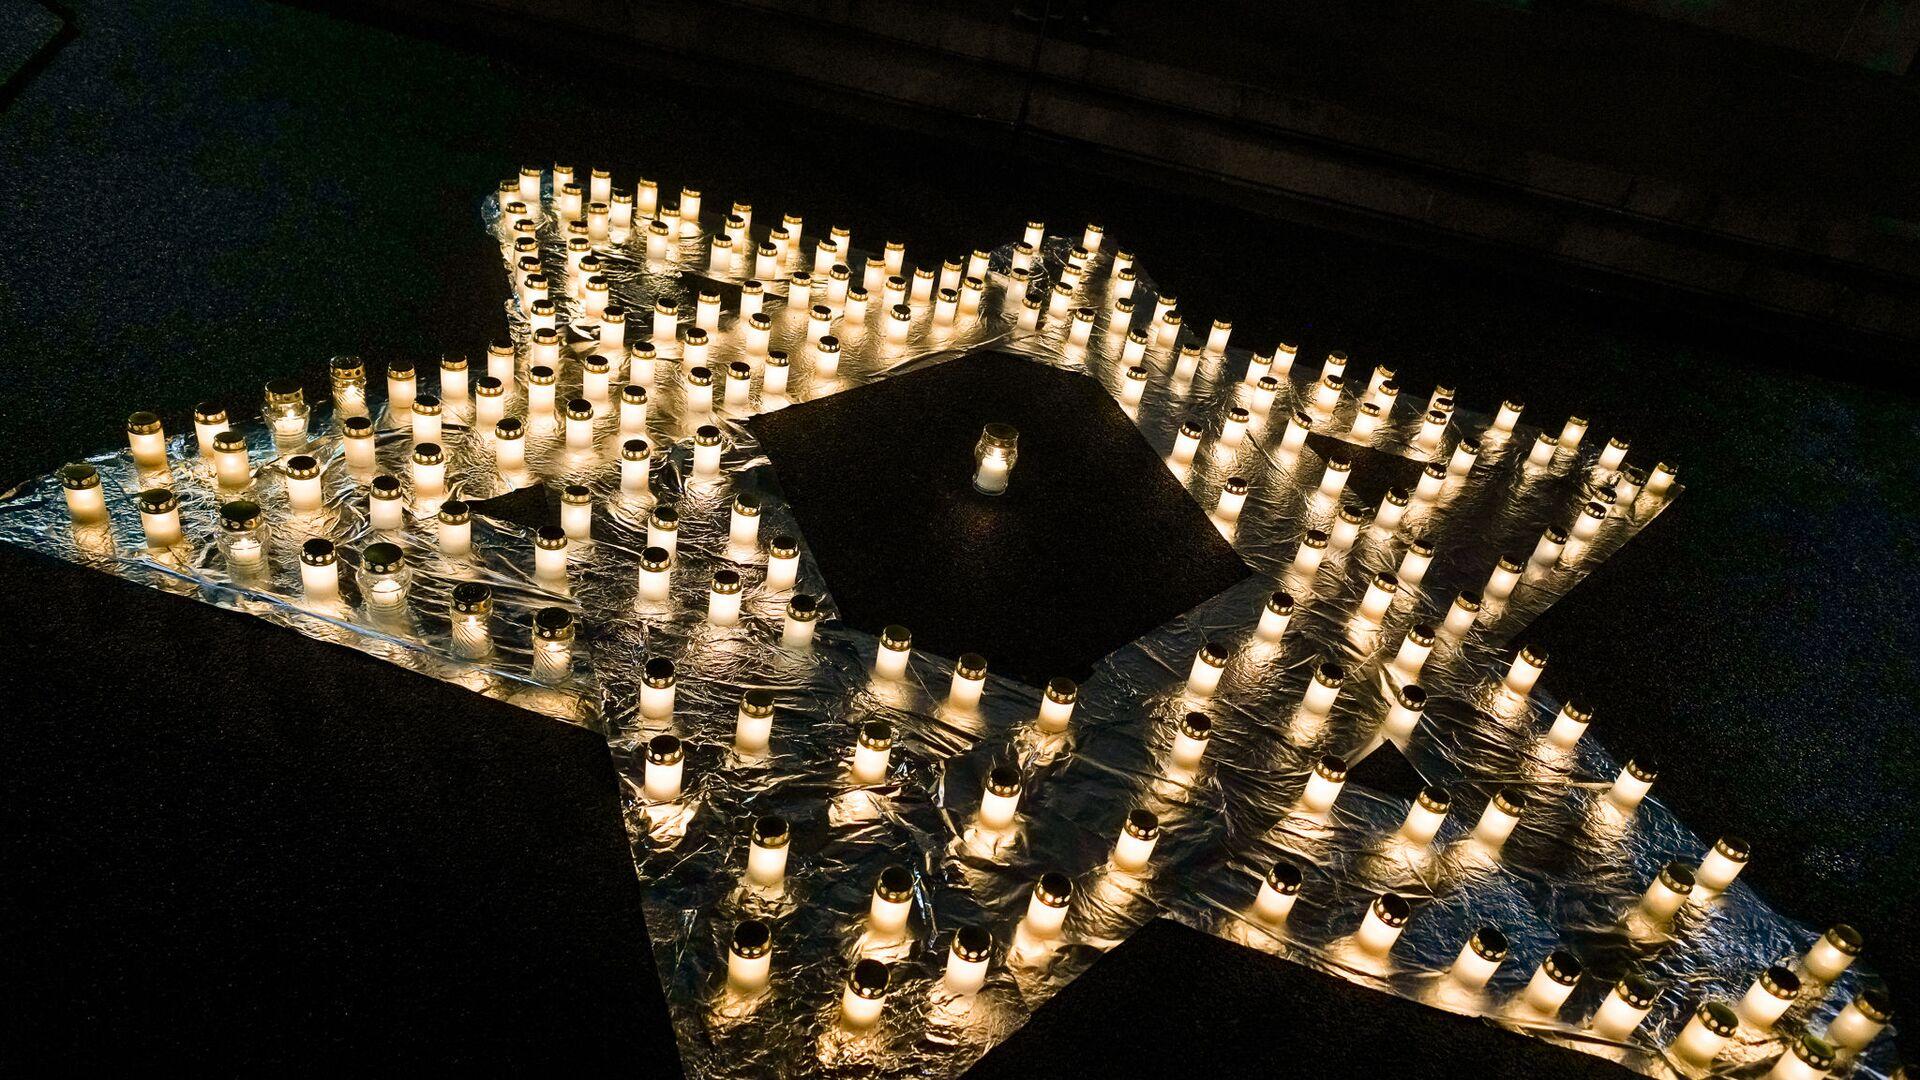 Звезда Давида у памятника Свободы - Sputnik Латвия, 1920, 25.08.2021